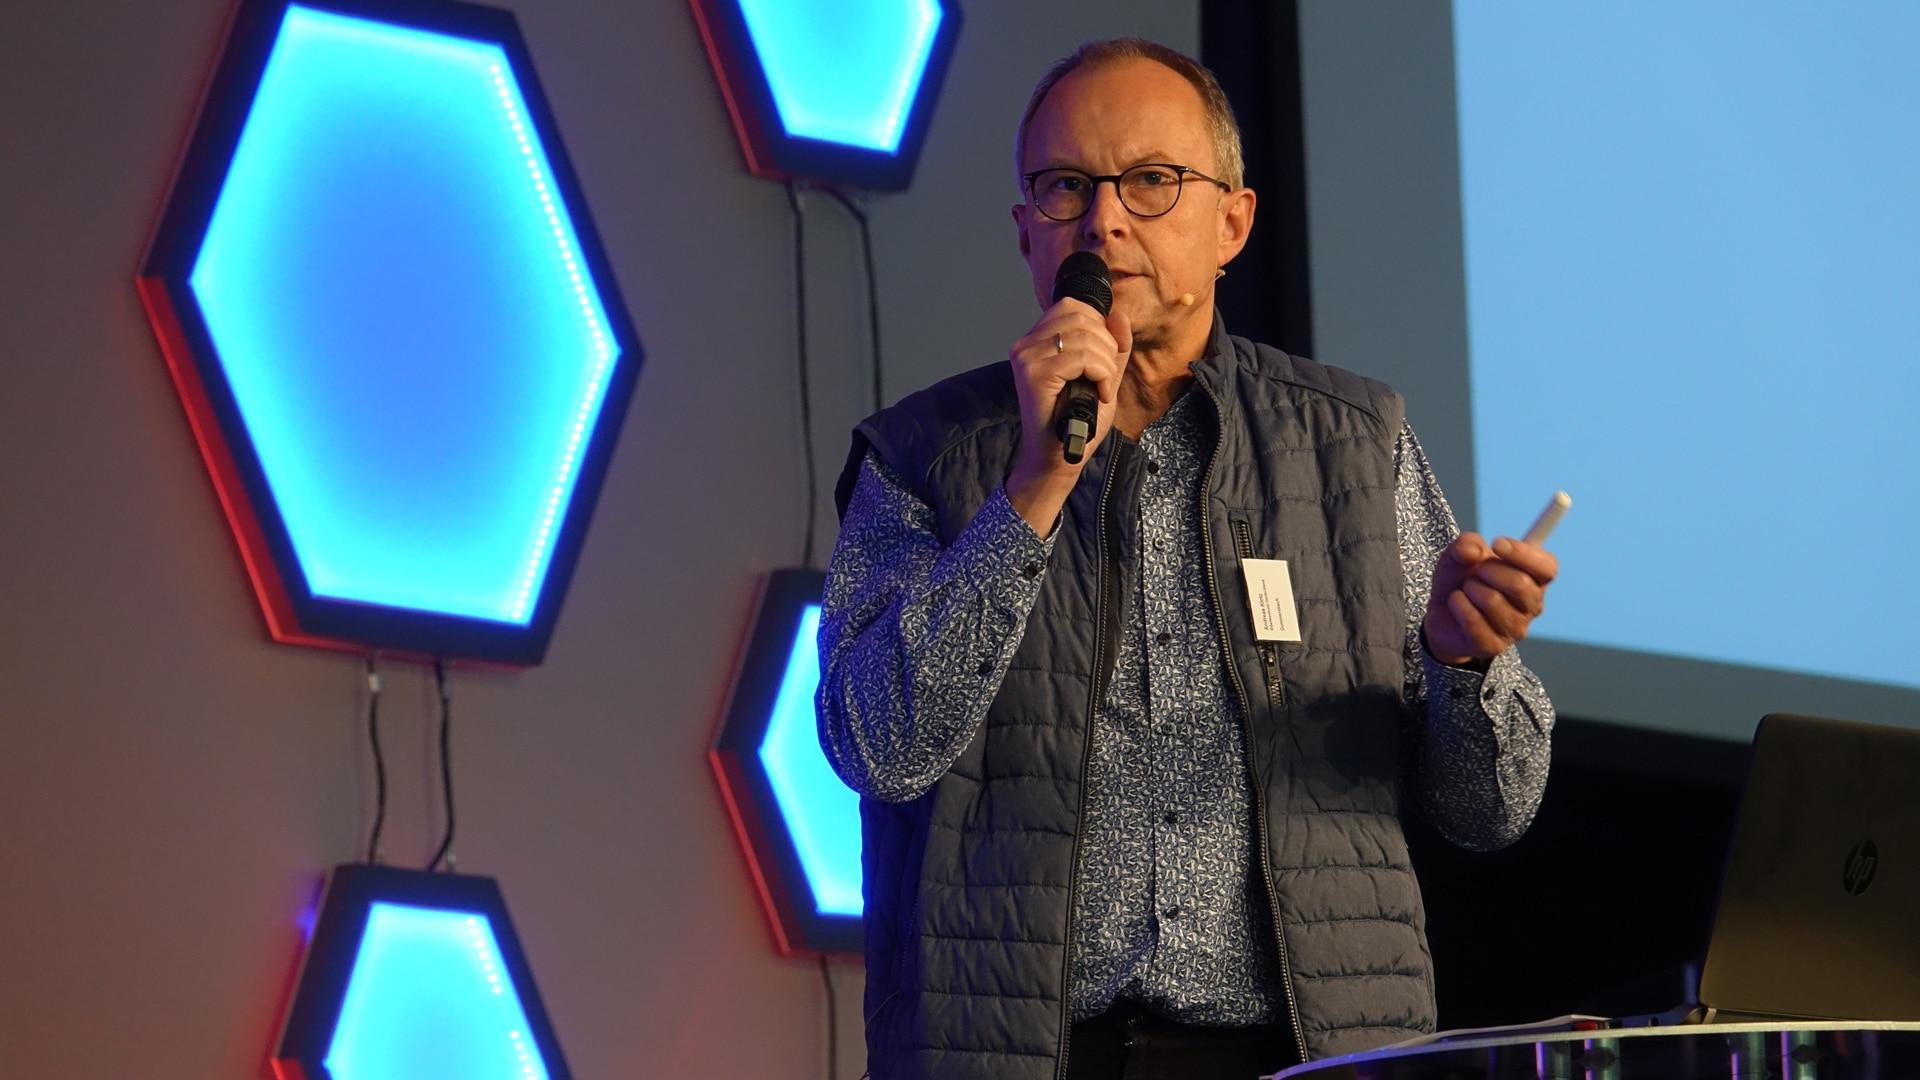 Andreas Klotz, Generalsekretär des Bibellesebundes